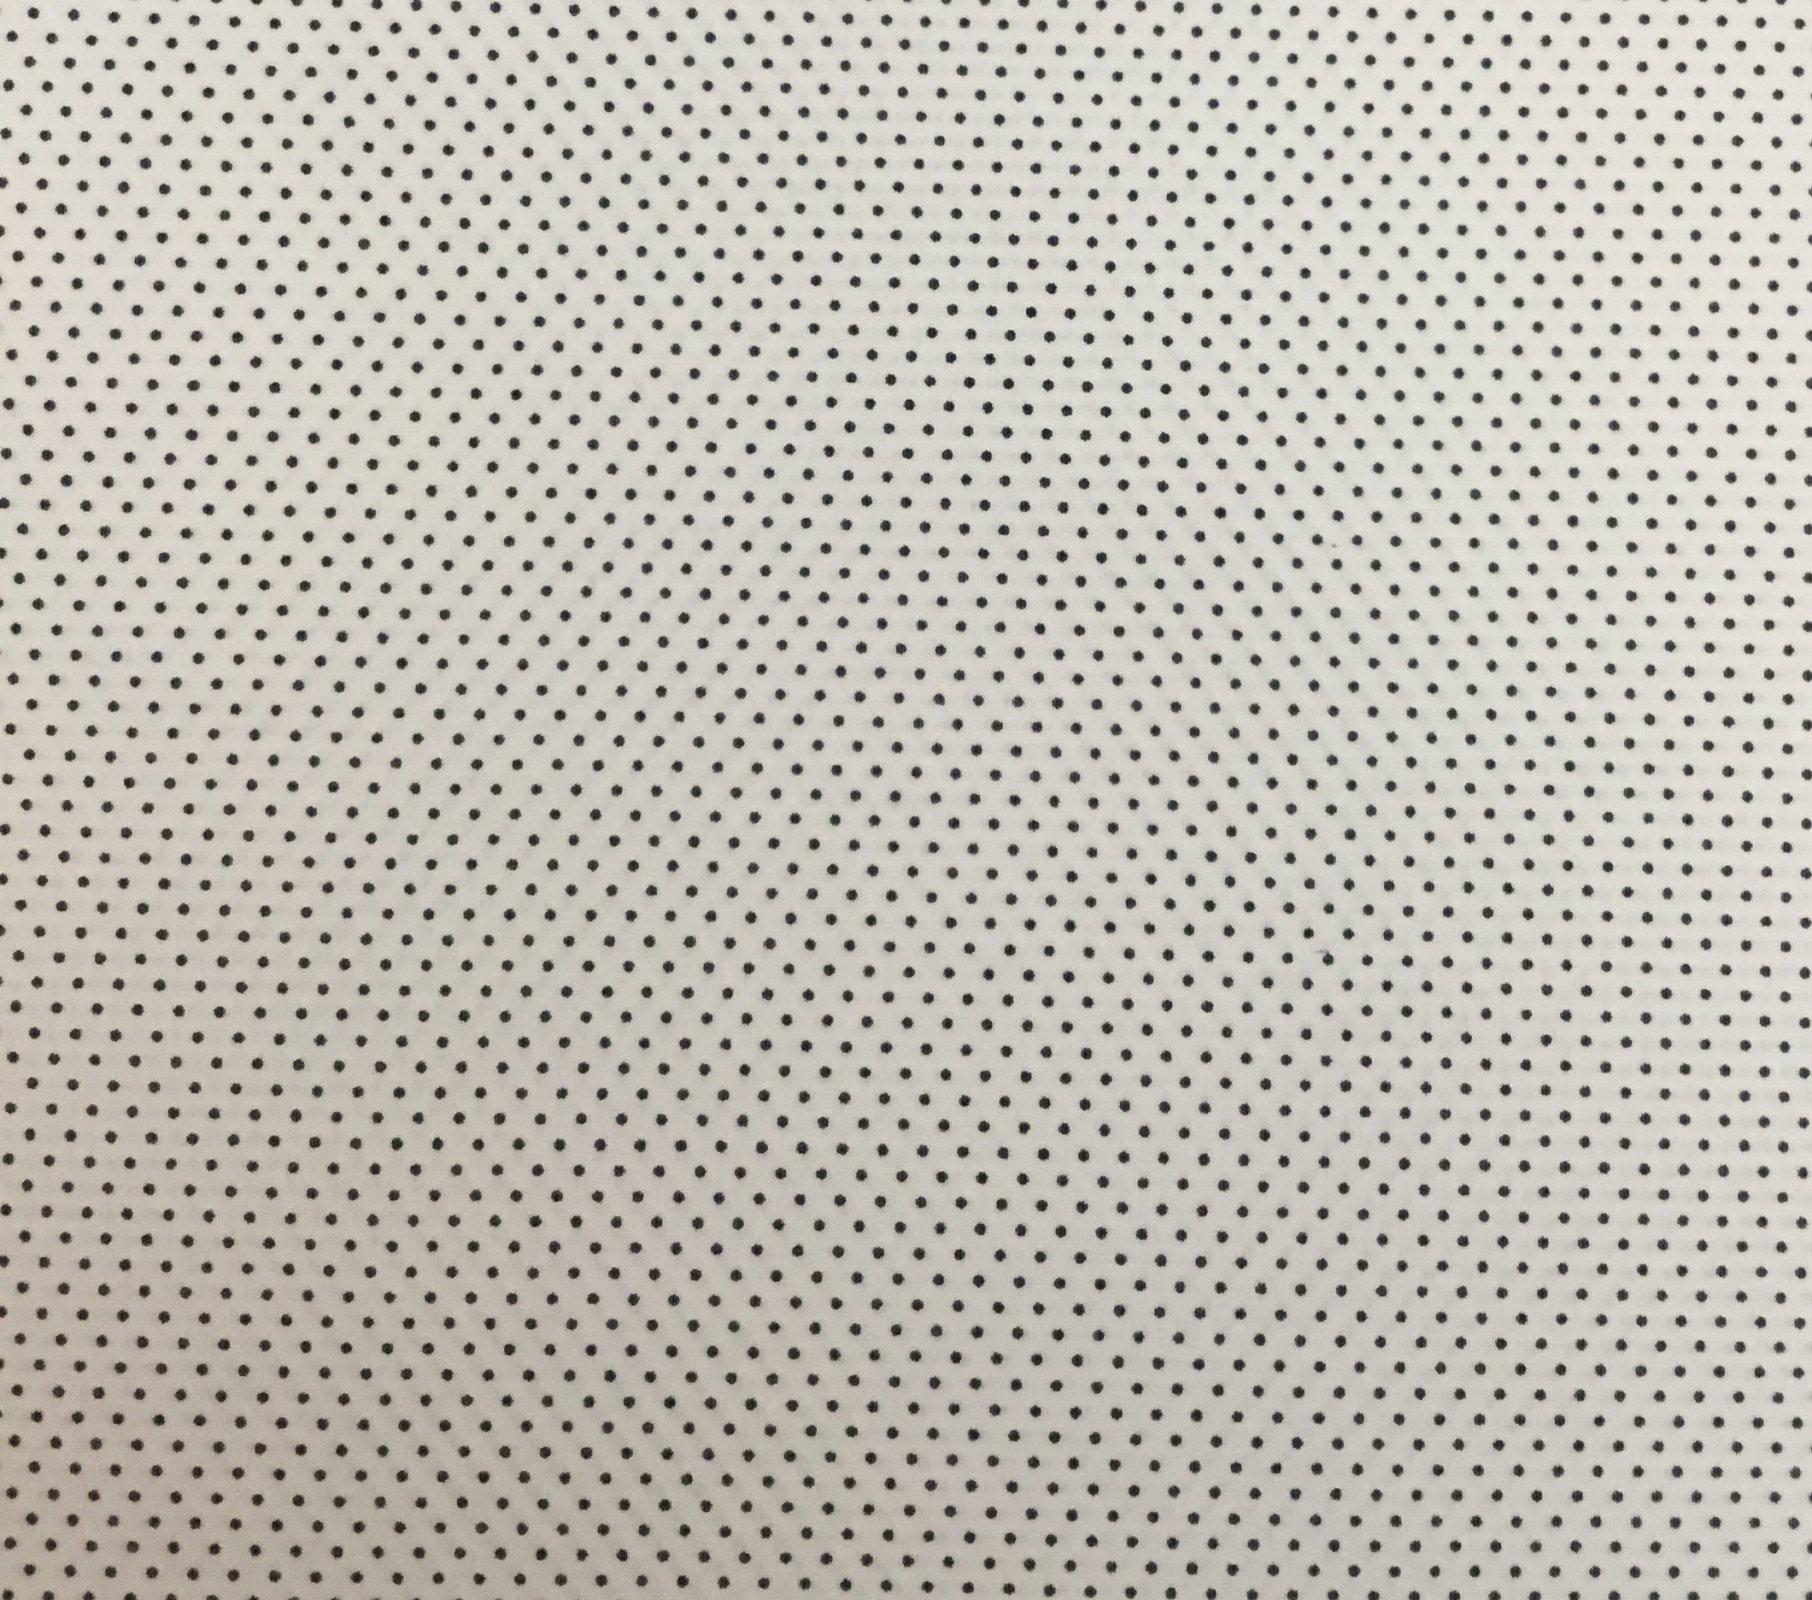 Adaman Coast - Monsoon Season - Dark Grey microdot on White